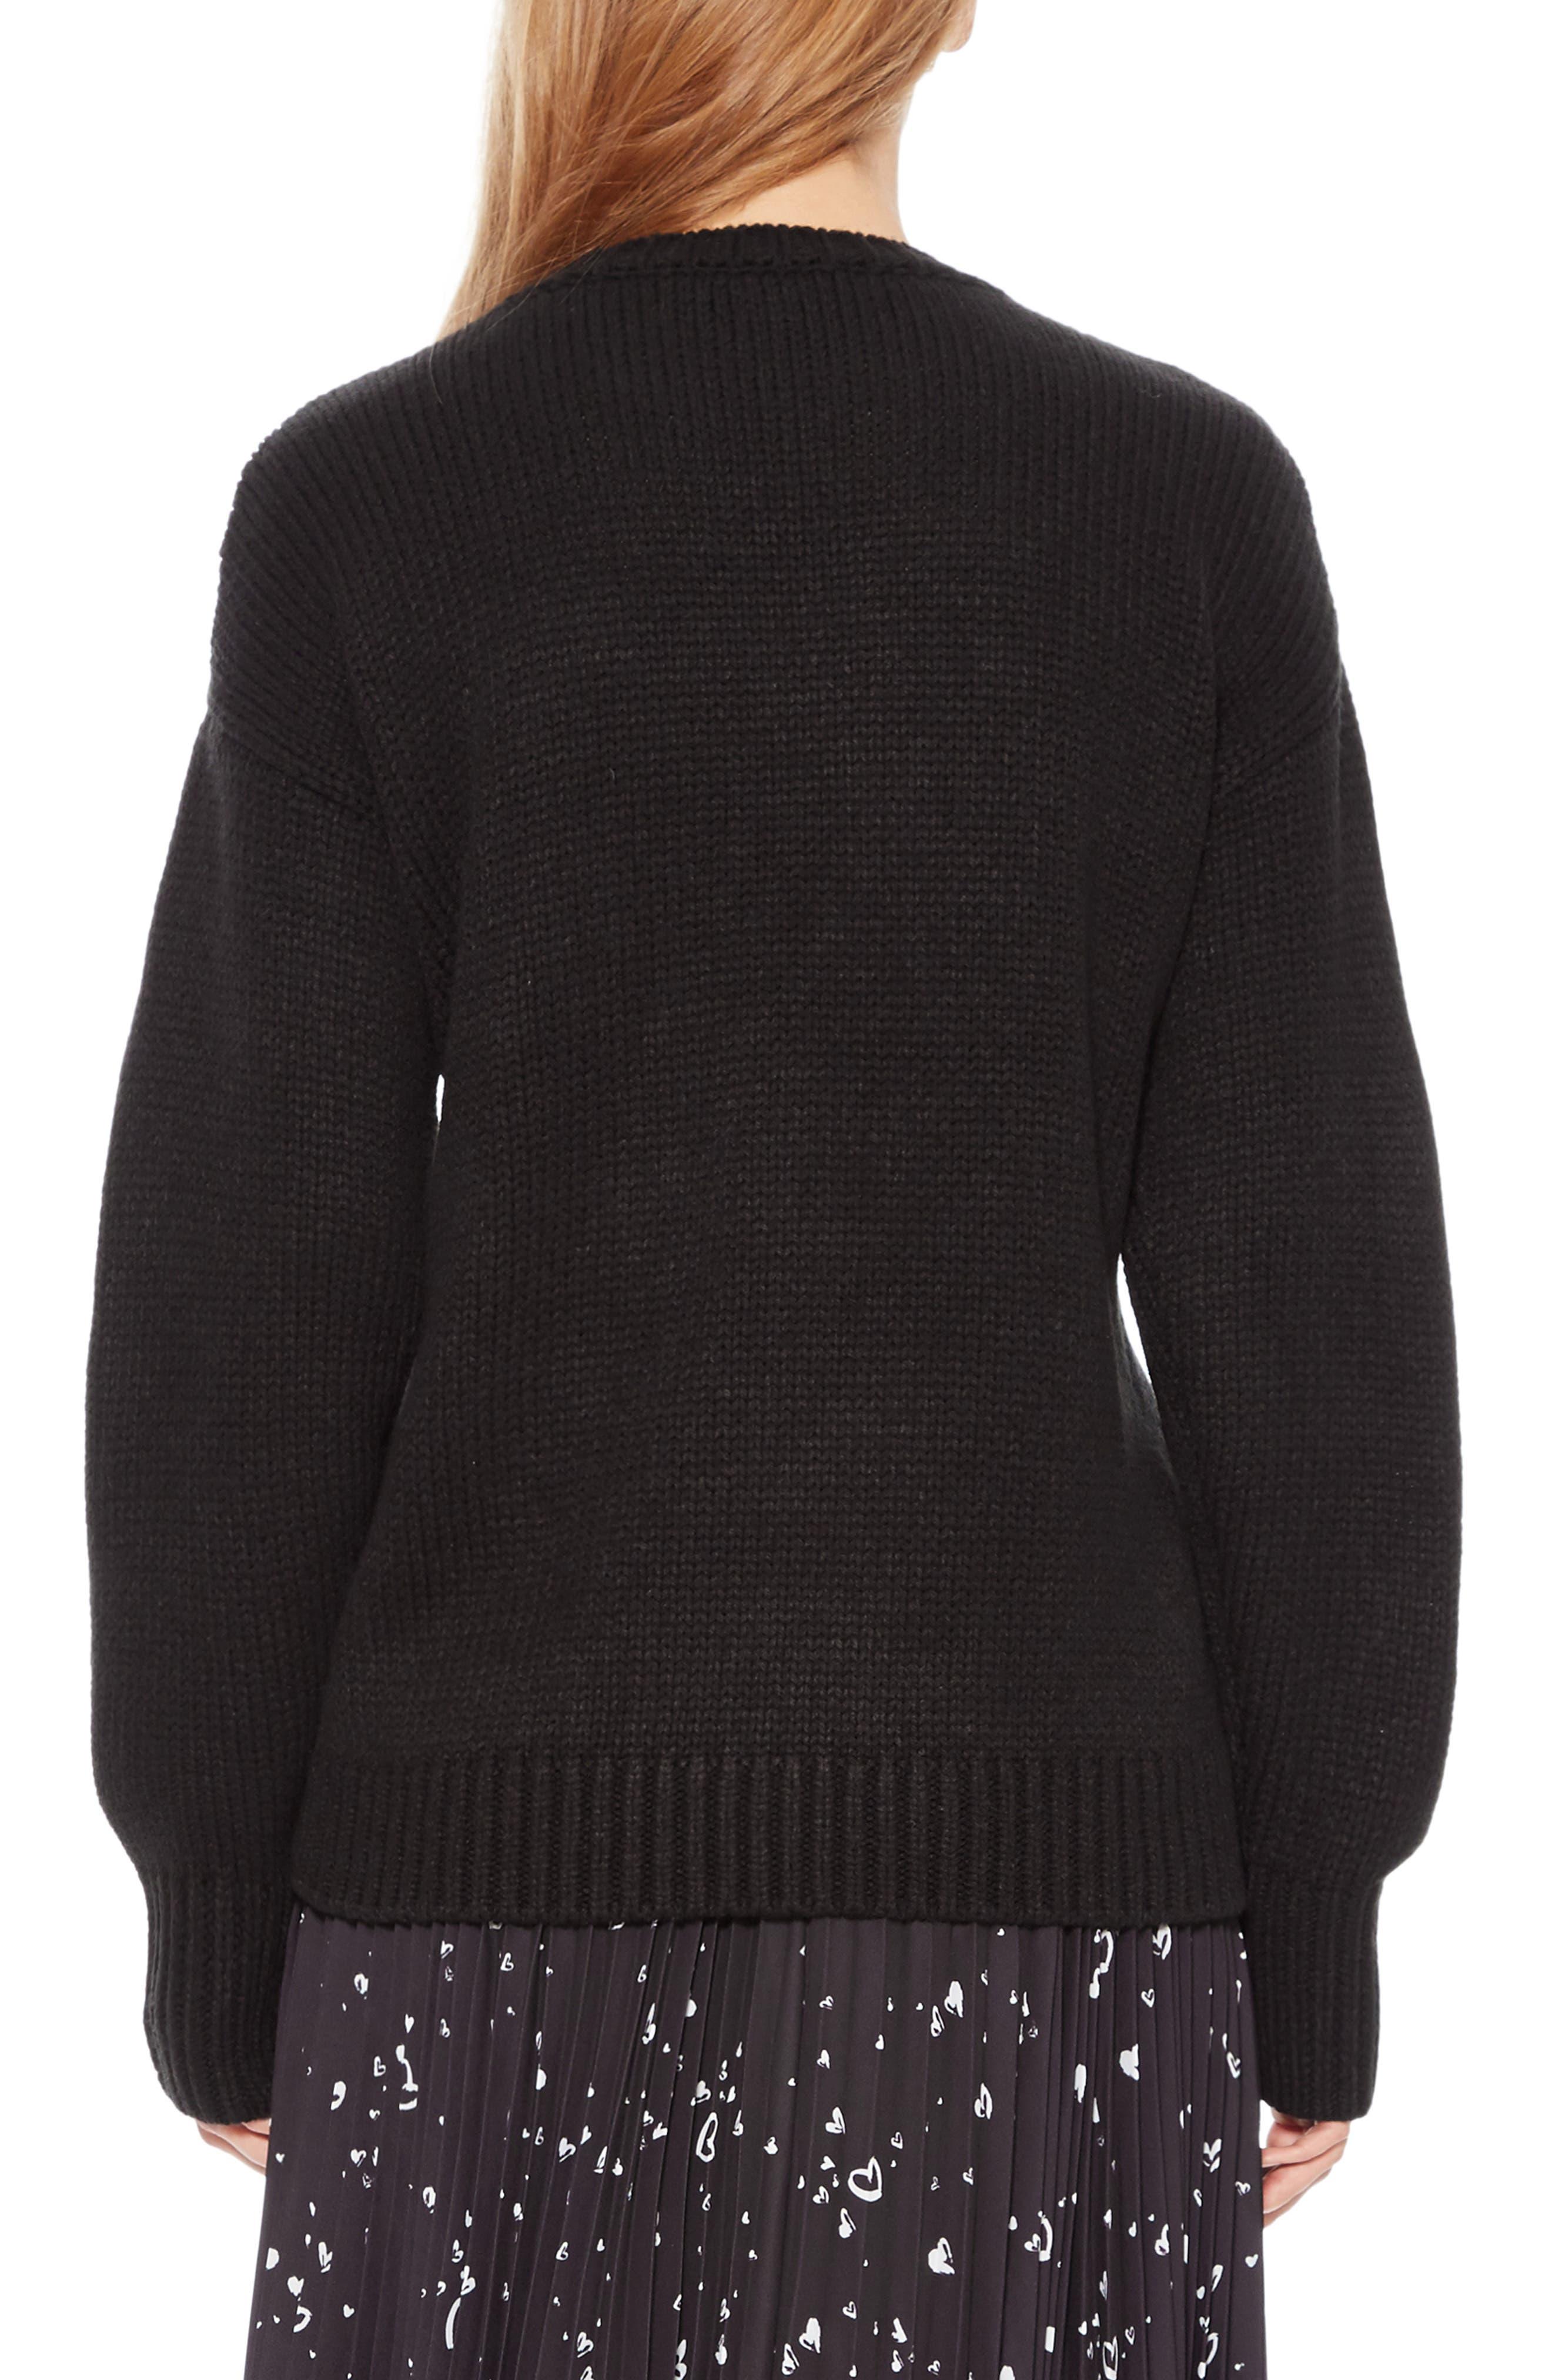 Olive Sweater,                             Alternate thumbnail 2, color,                             BLACK IVORY